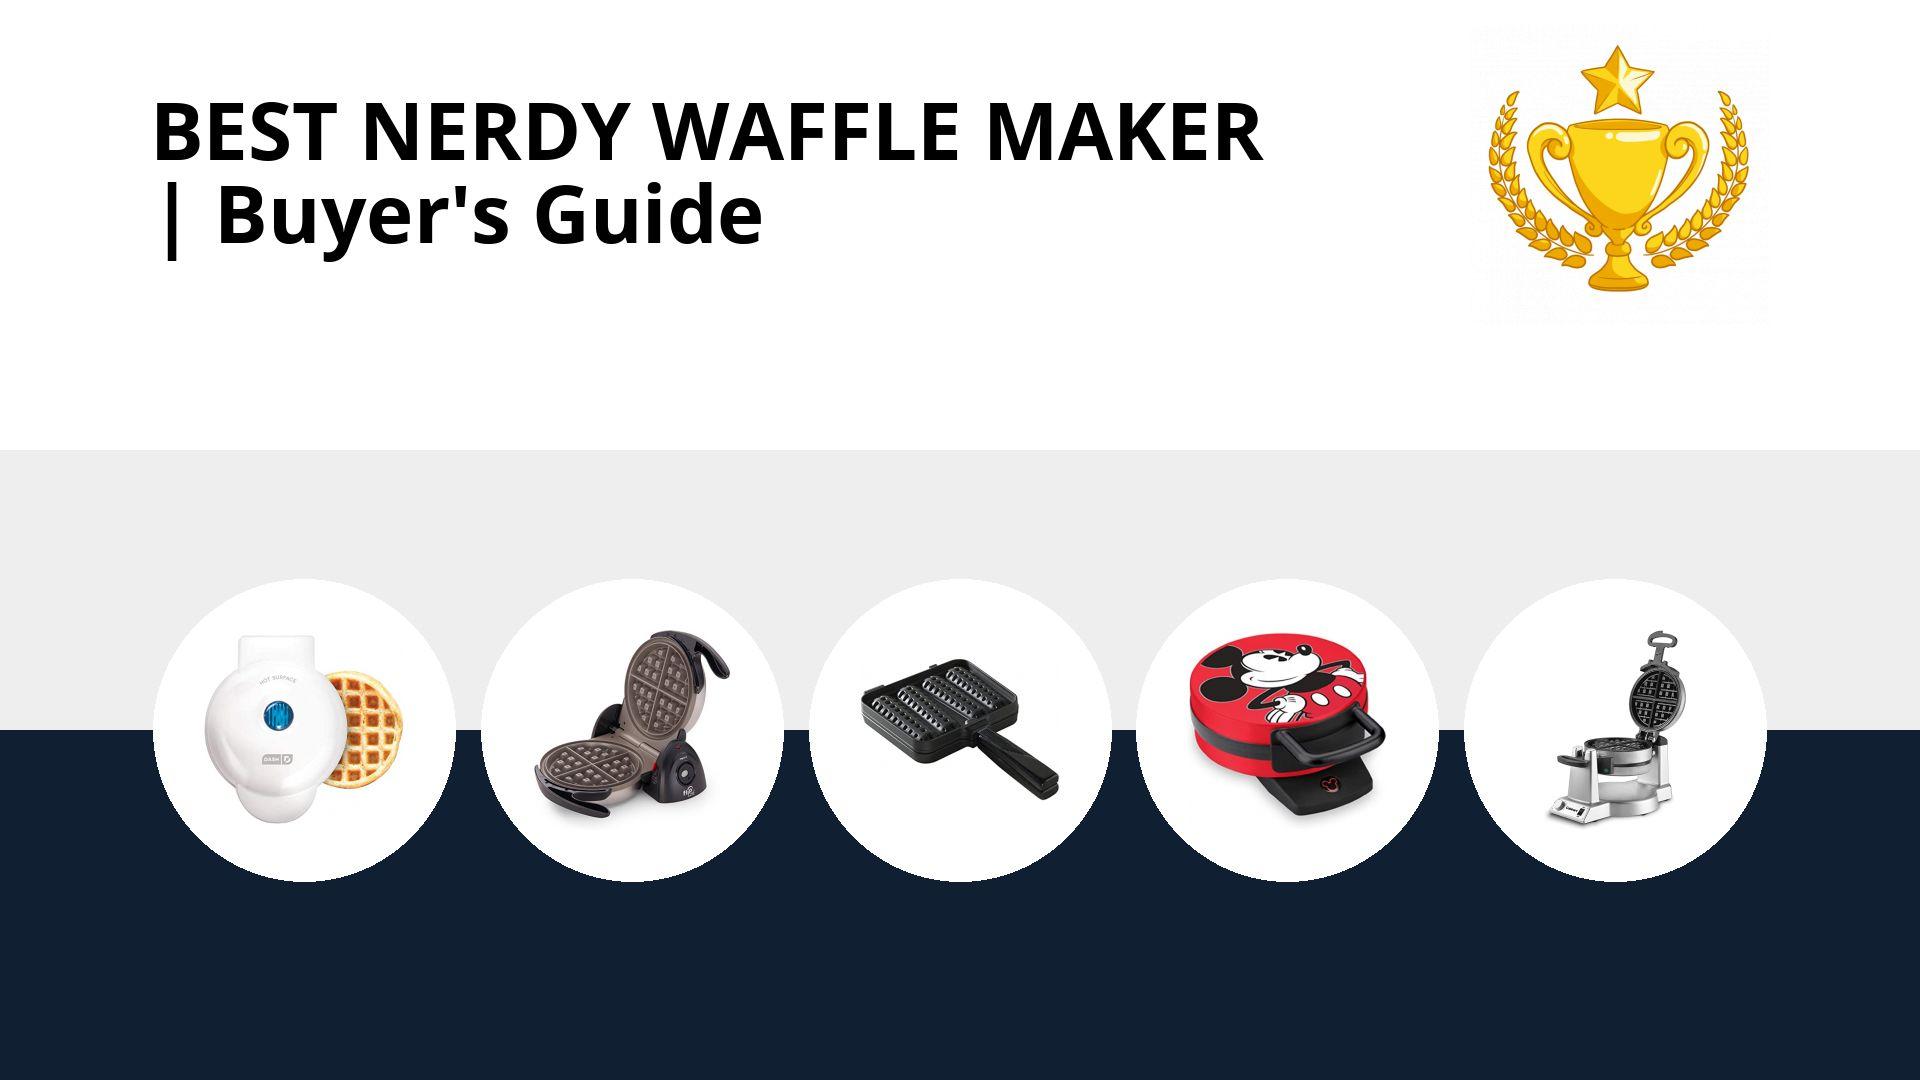 Best Nerdy Waffle Maker: image